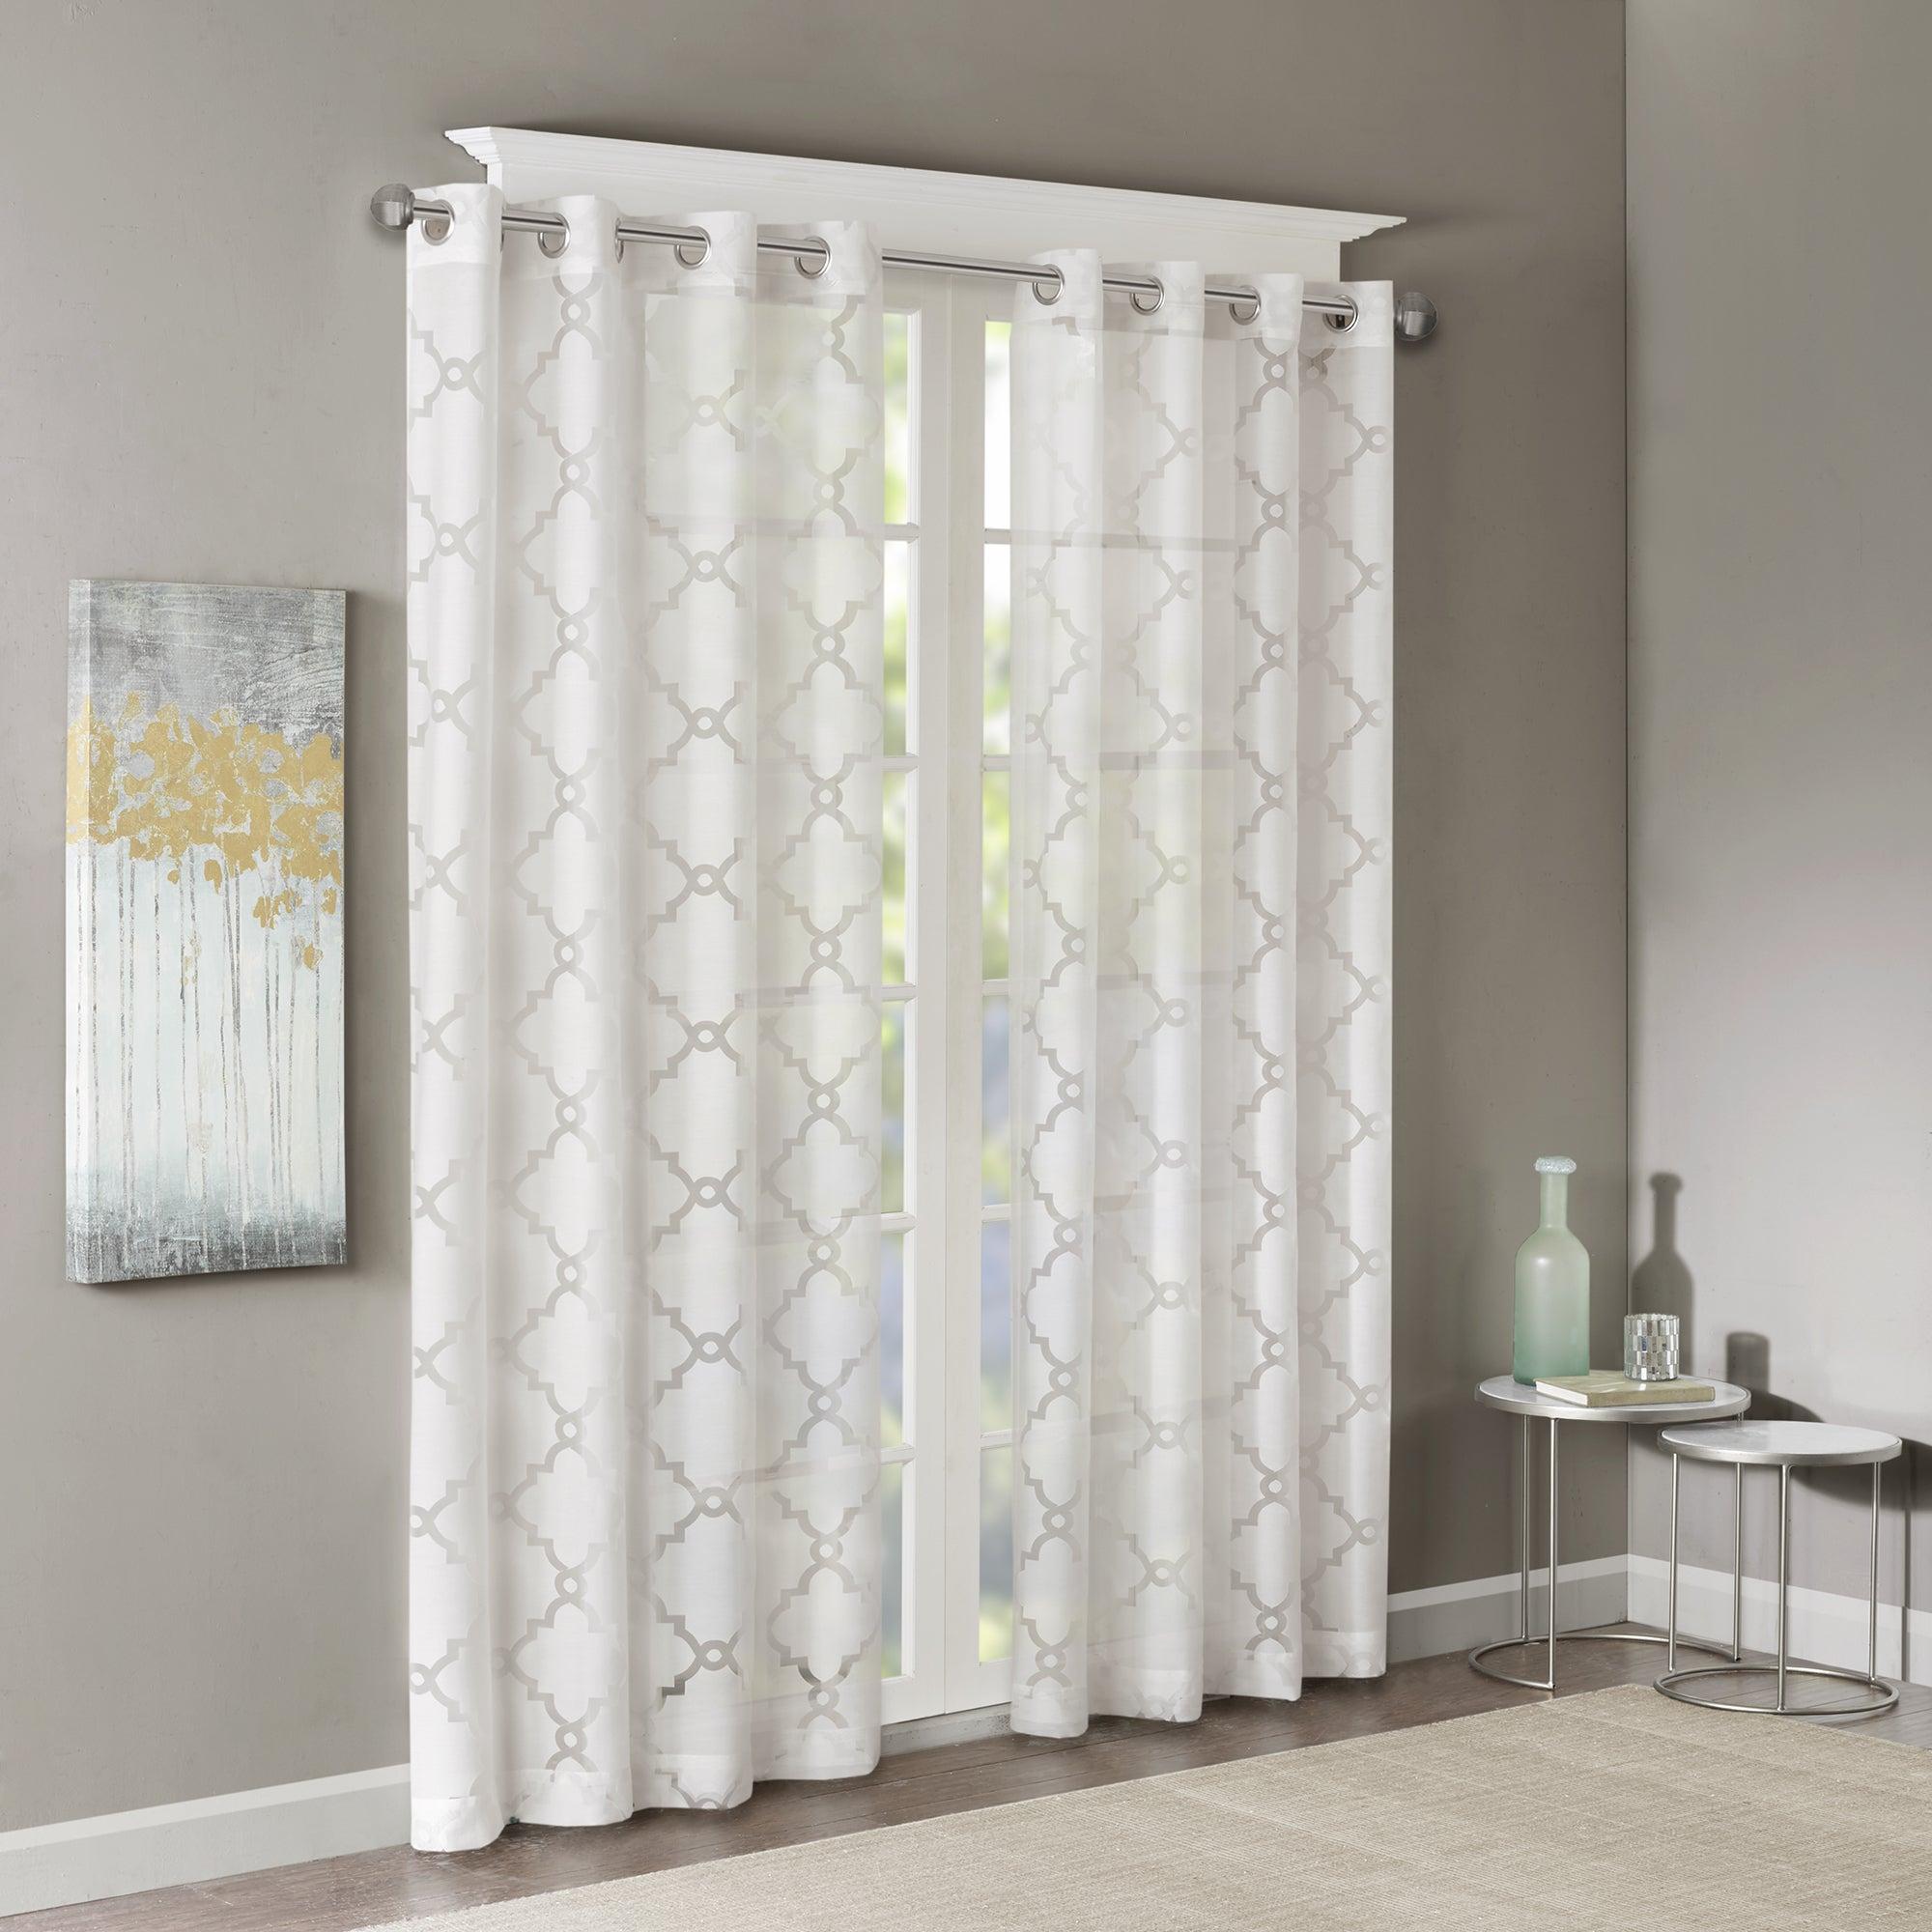 Madison Park Laya Fretwork Burnout Sheer Curtain Panel Regarding Vina Sheer Bird Single Curtain Panels (View 9 of 30)